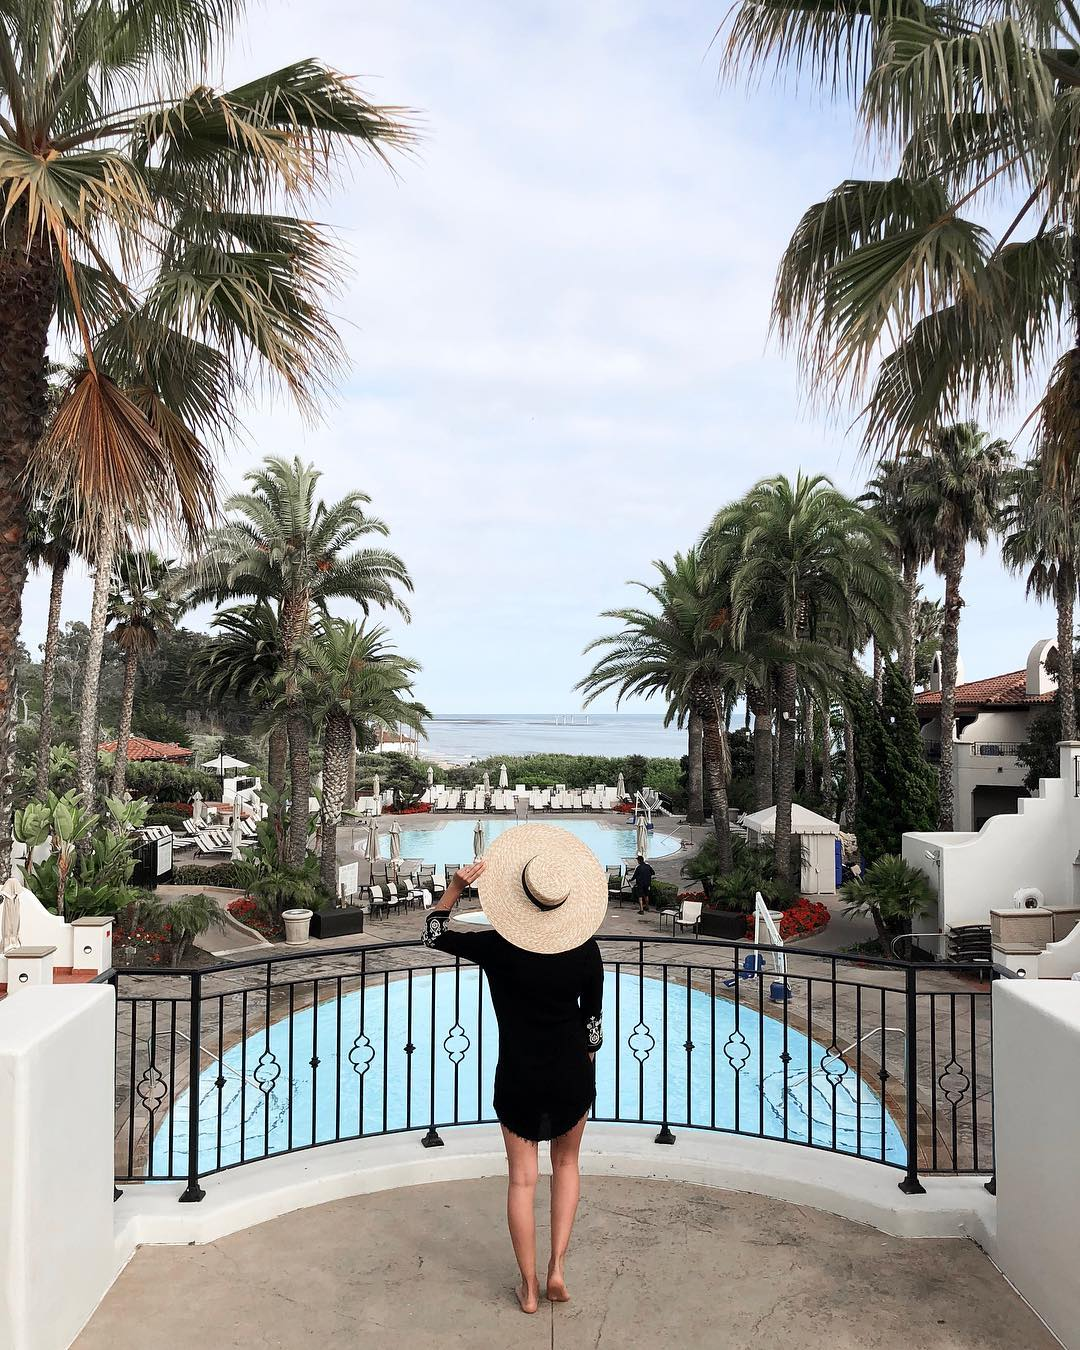 The Ritz Carlton Bacara Santa Barbara